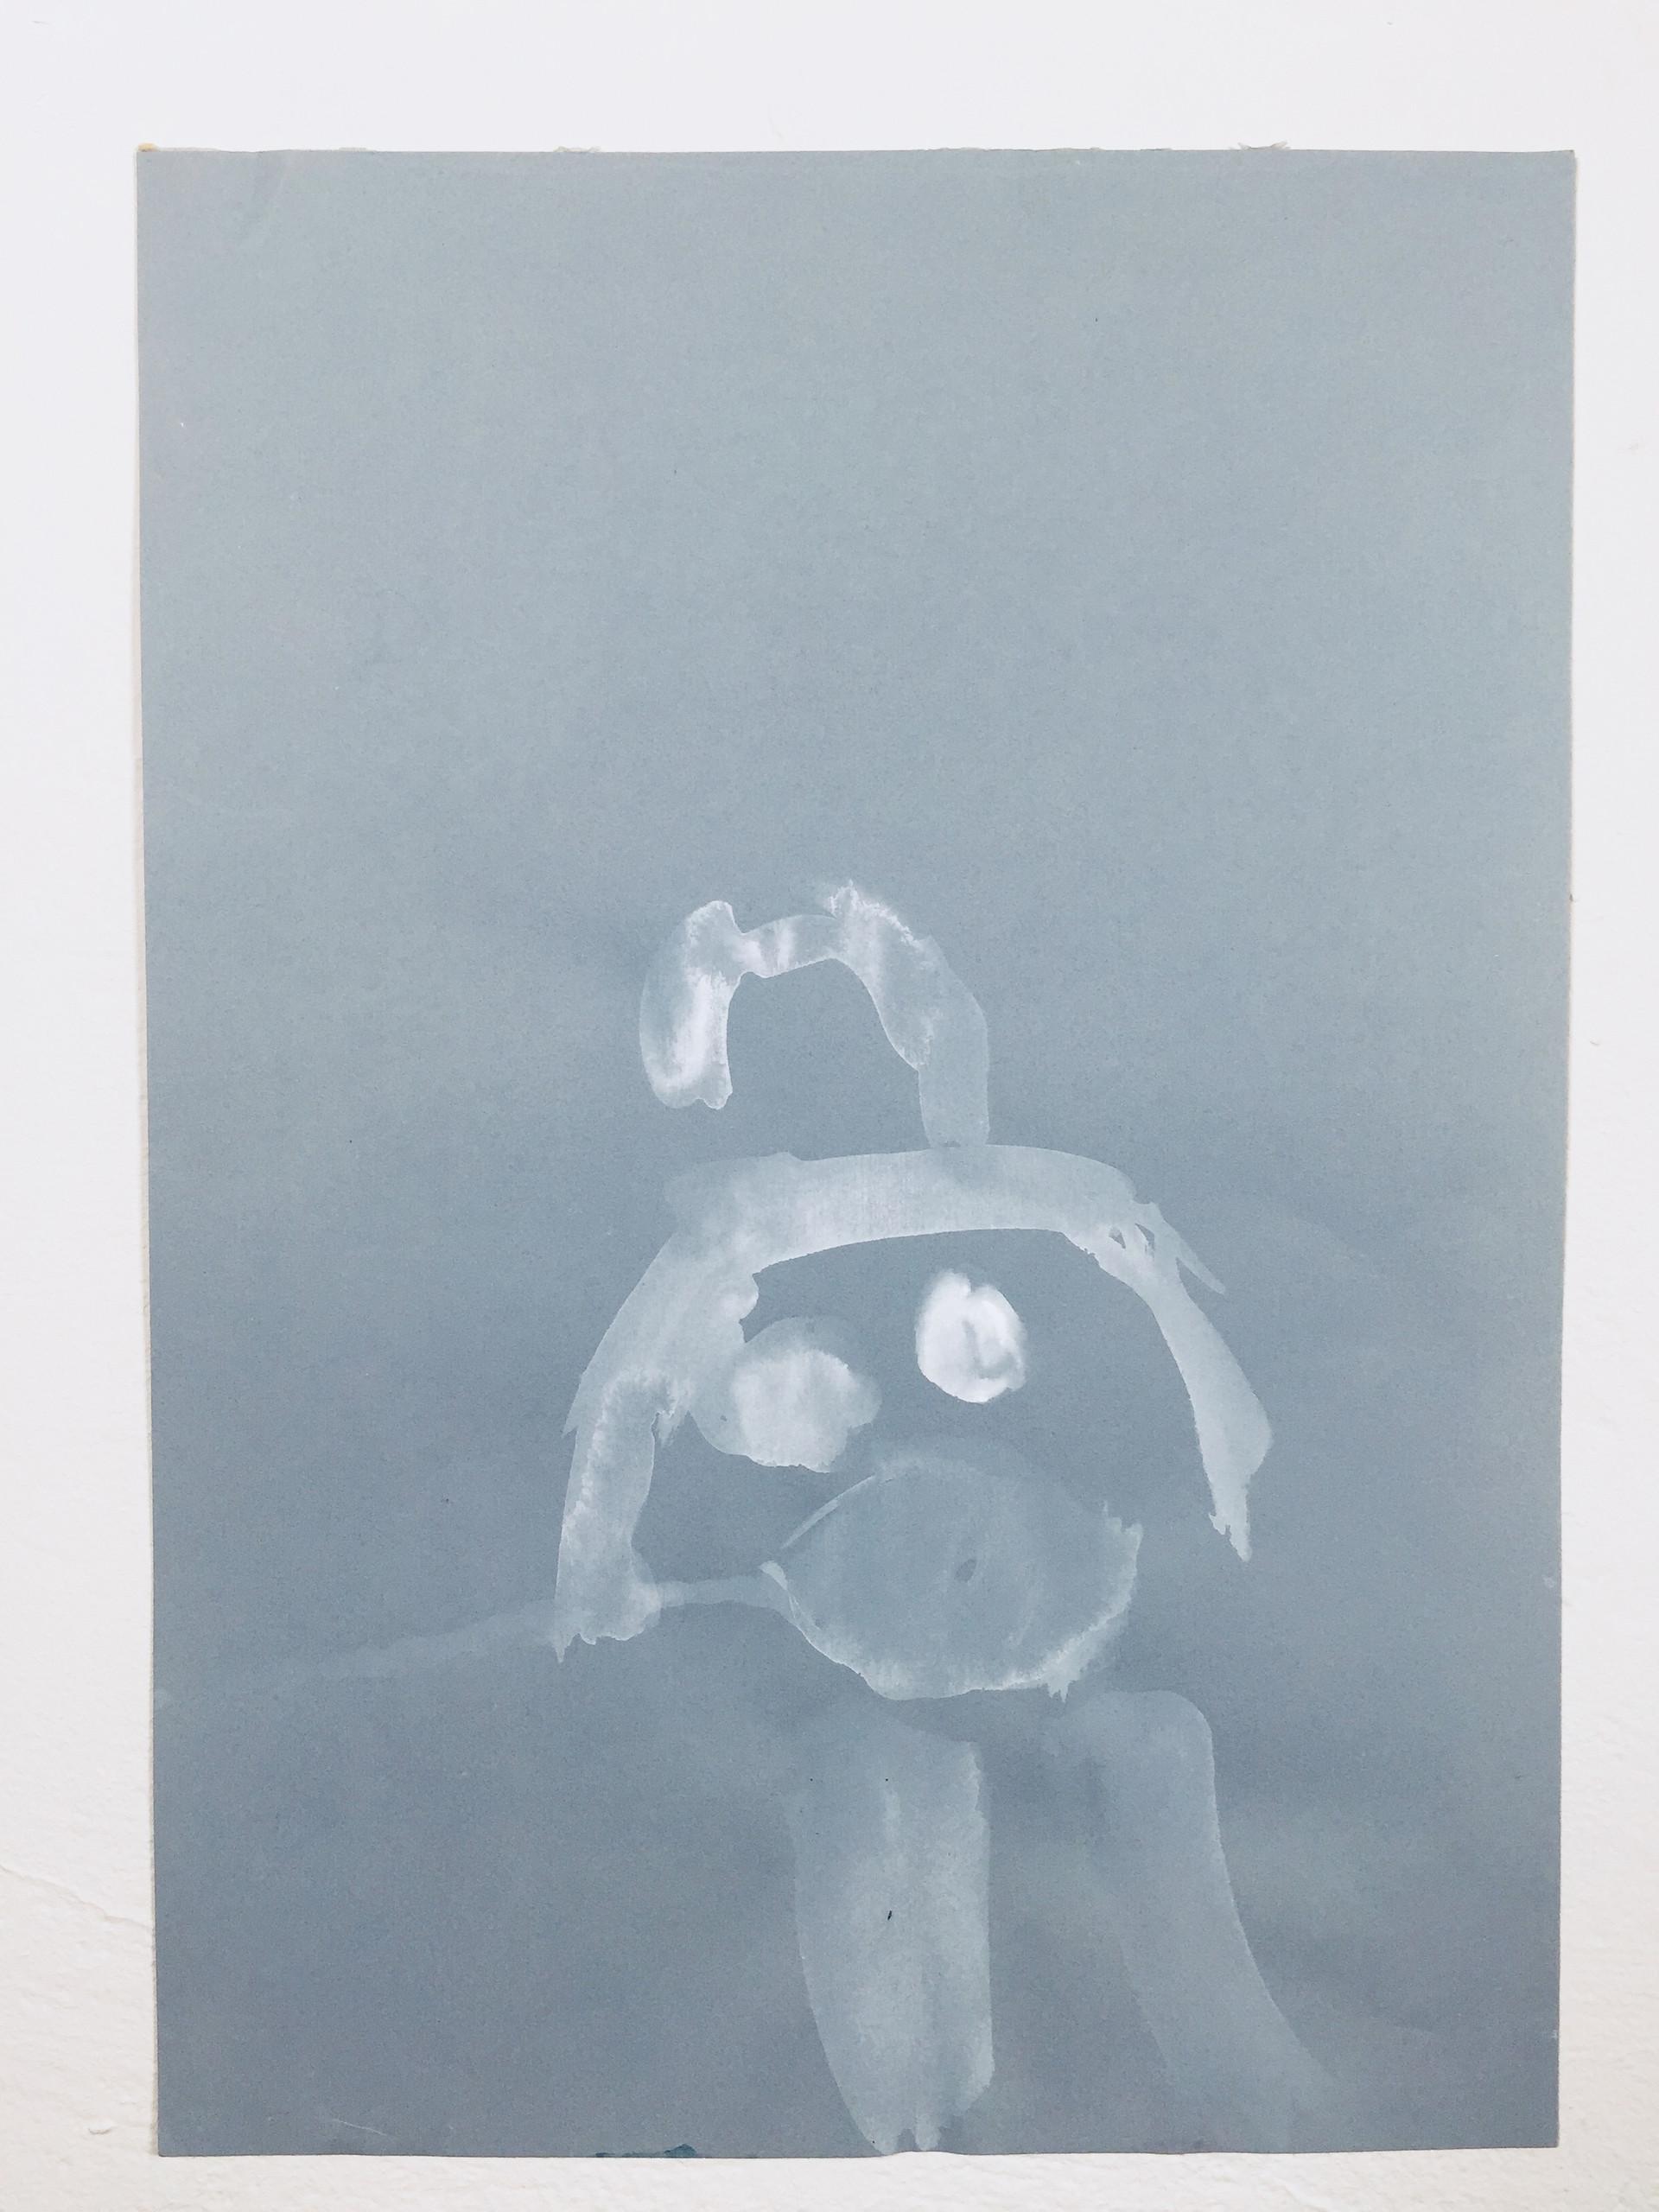 Naked Soul-Self Portrait, acrylic on paper, 1997